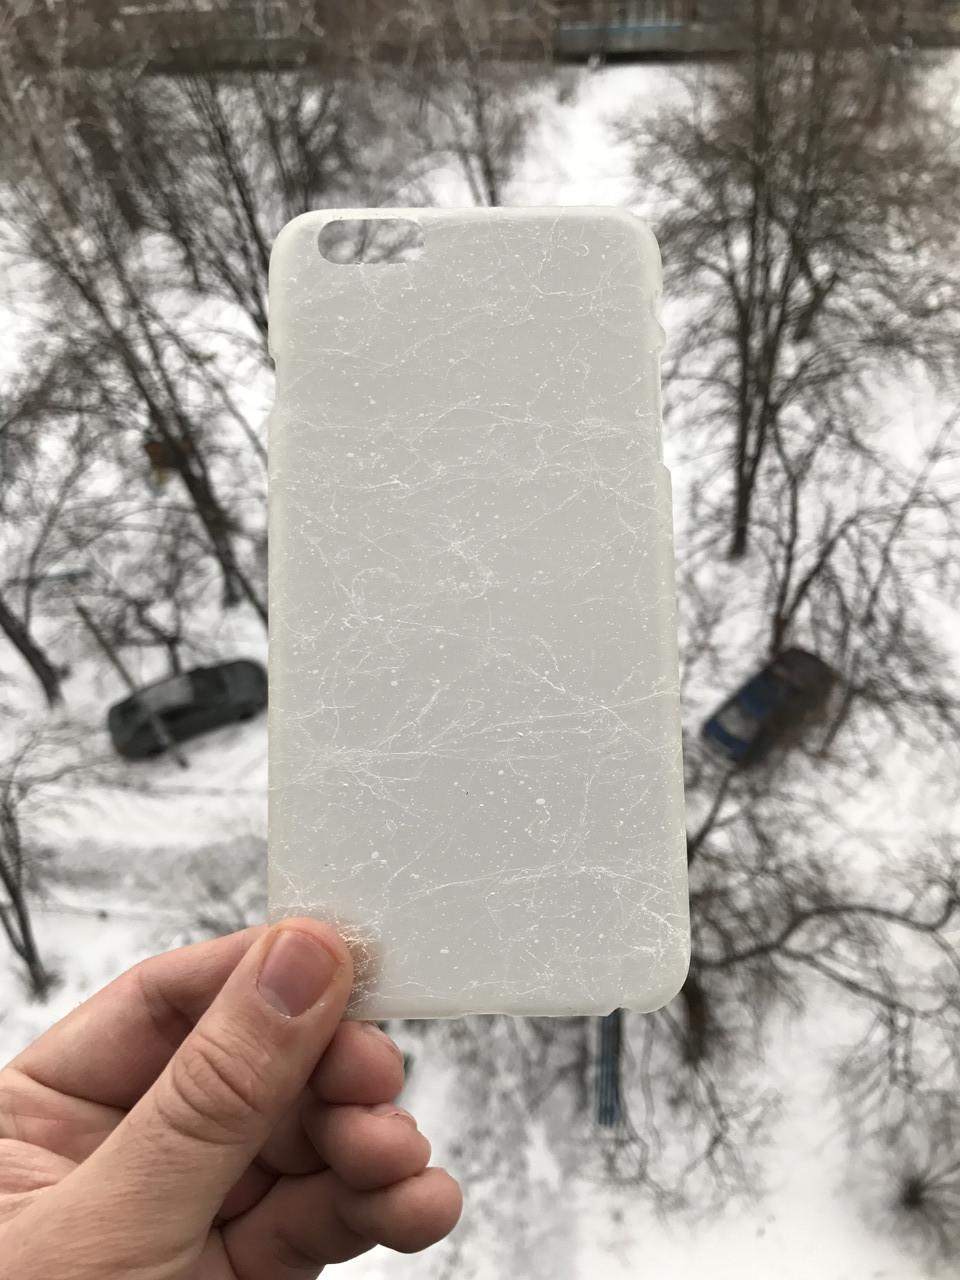 Чехол паутина iphone 6/6s plus + защитное стекло на экран в подарок